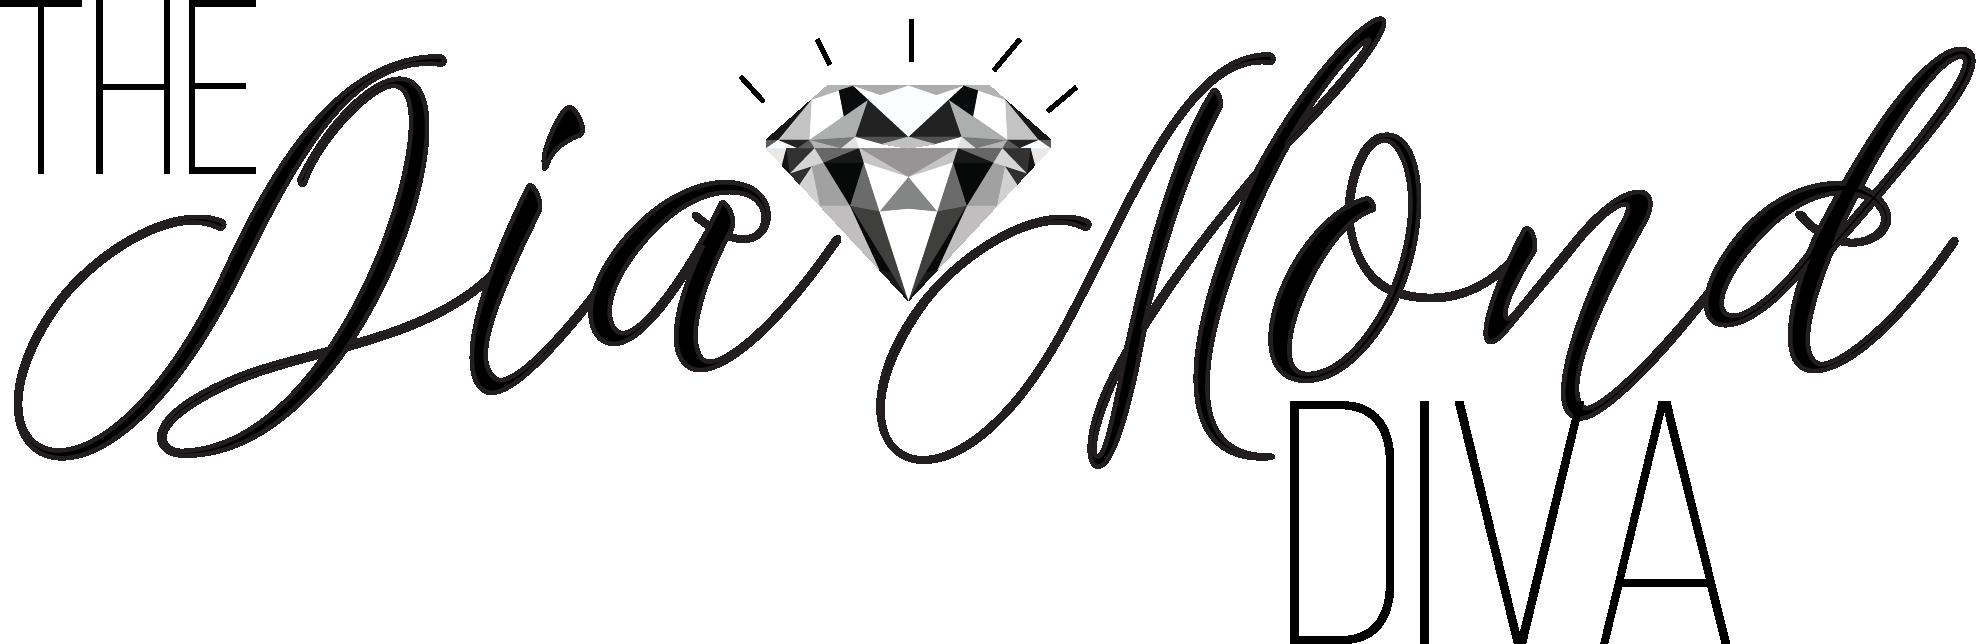 DiamondDivaLOGOBW.png